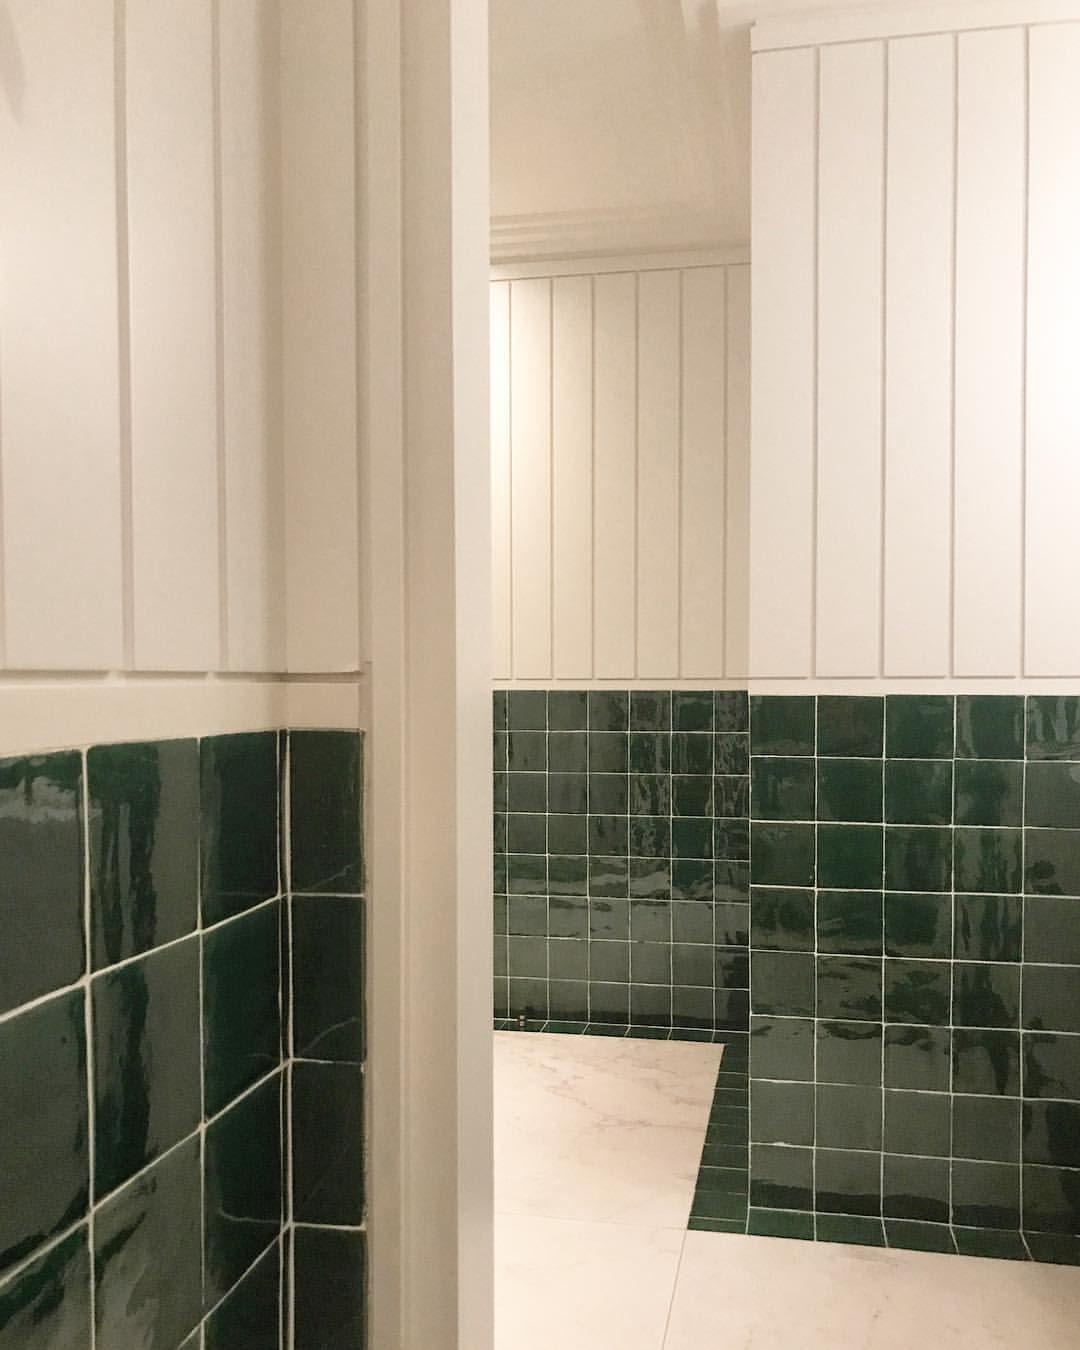 Bathroom interior wall  likes  comments  dl mrdavidlawrence on instagram ucgreen